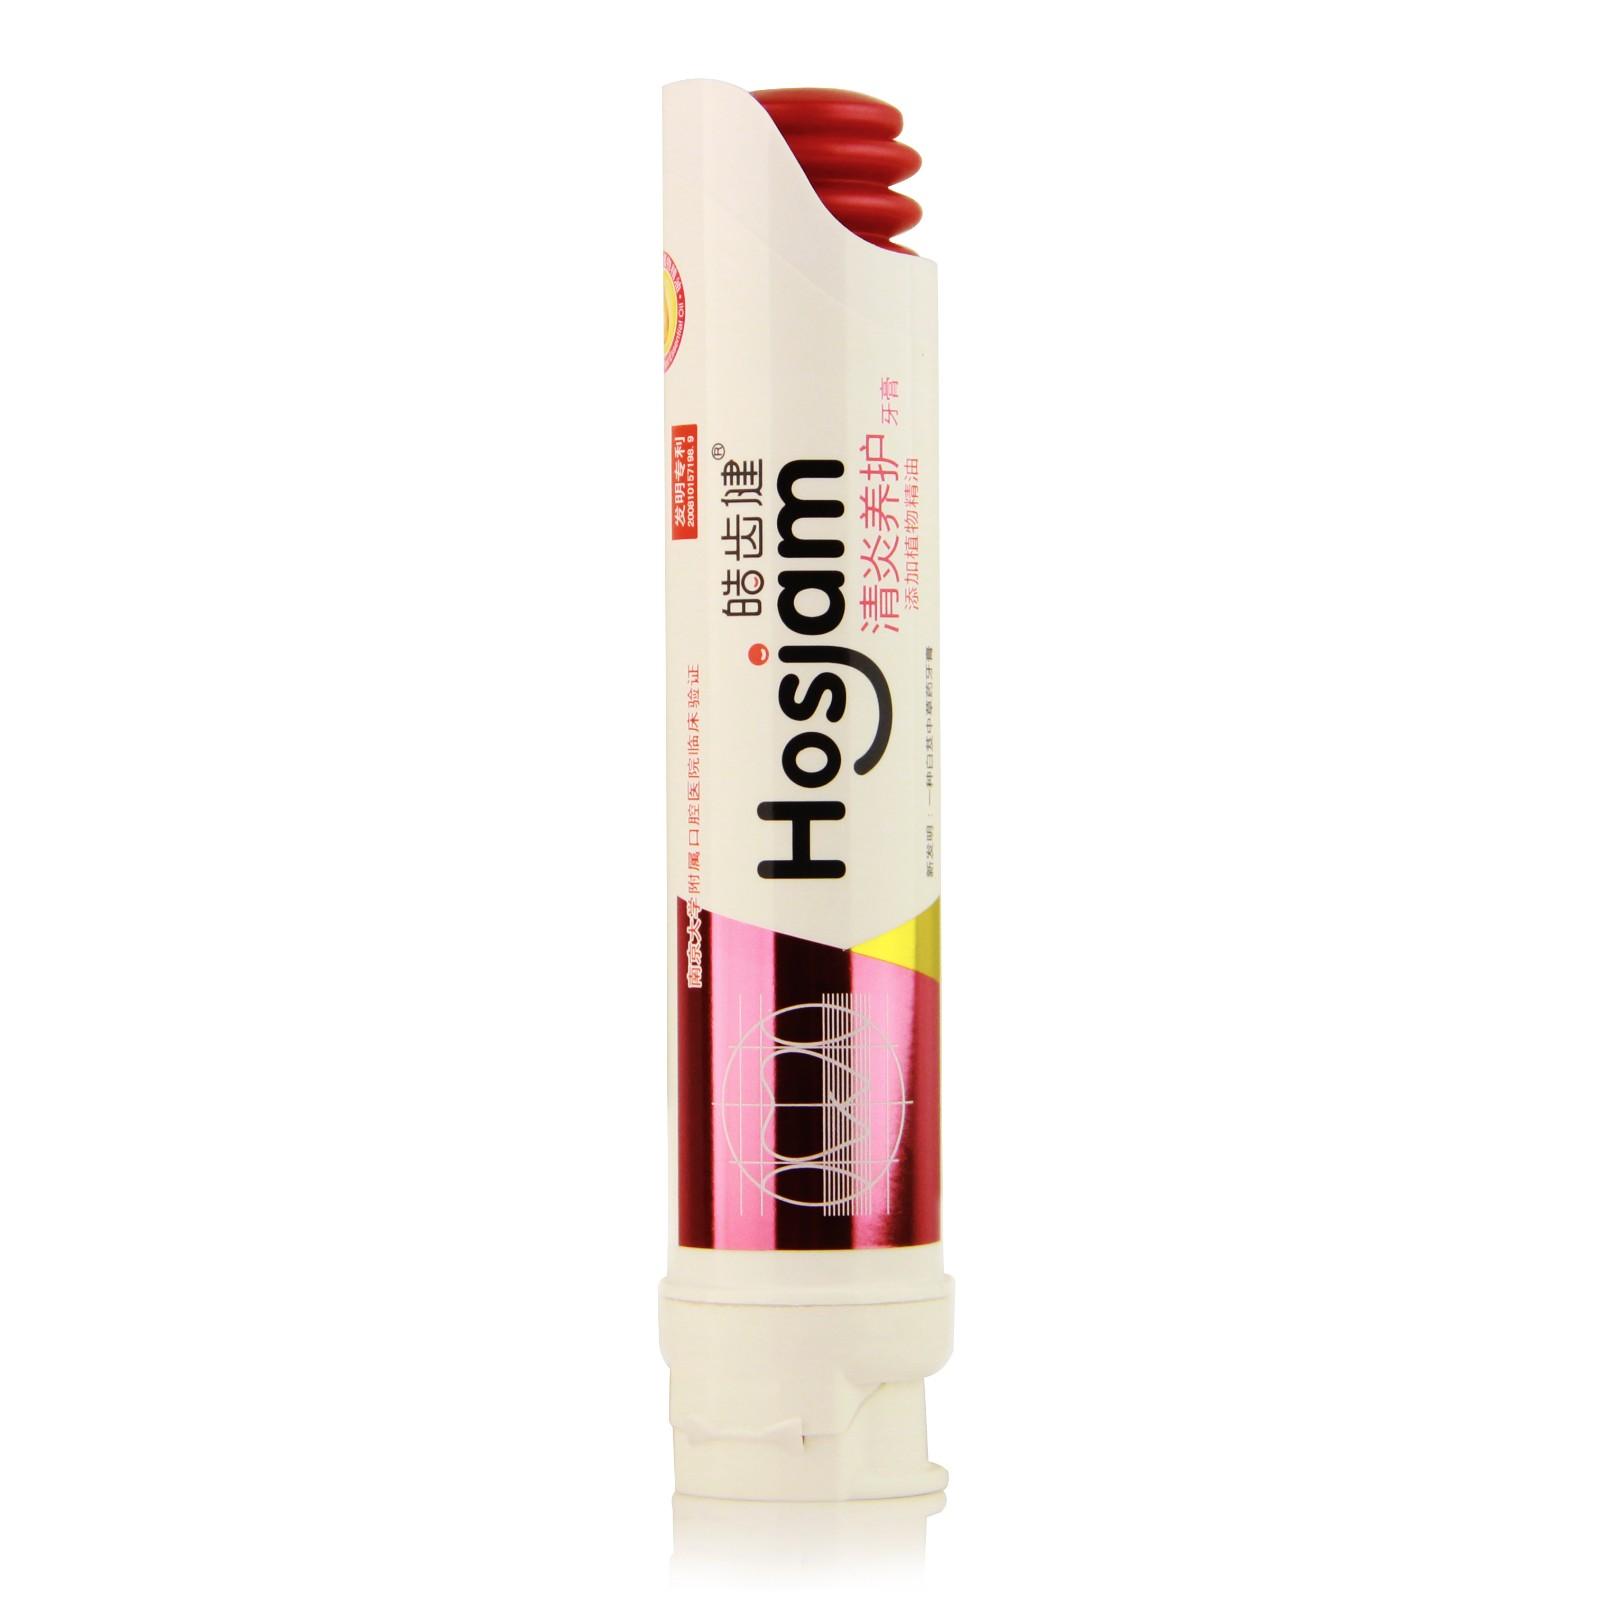 Hosjam皓齿健清炎养护环保压泵式牙膏100g+100g (浪漫玫瑰味)